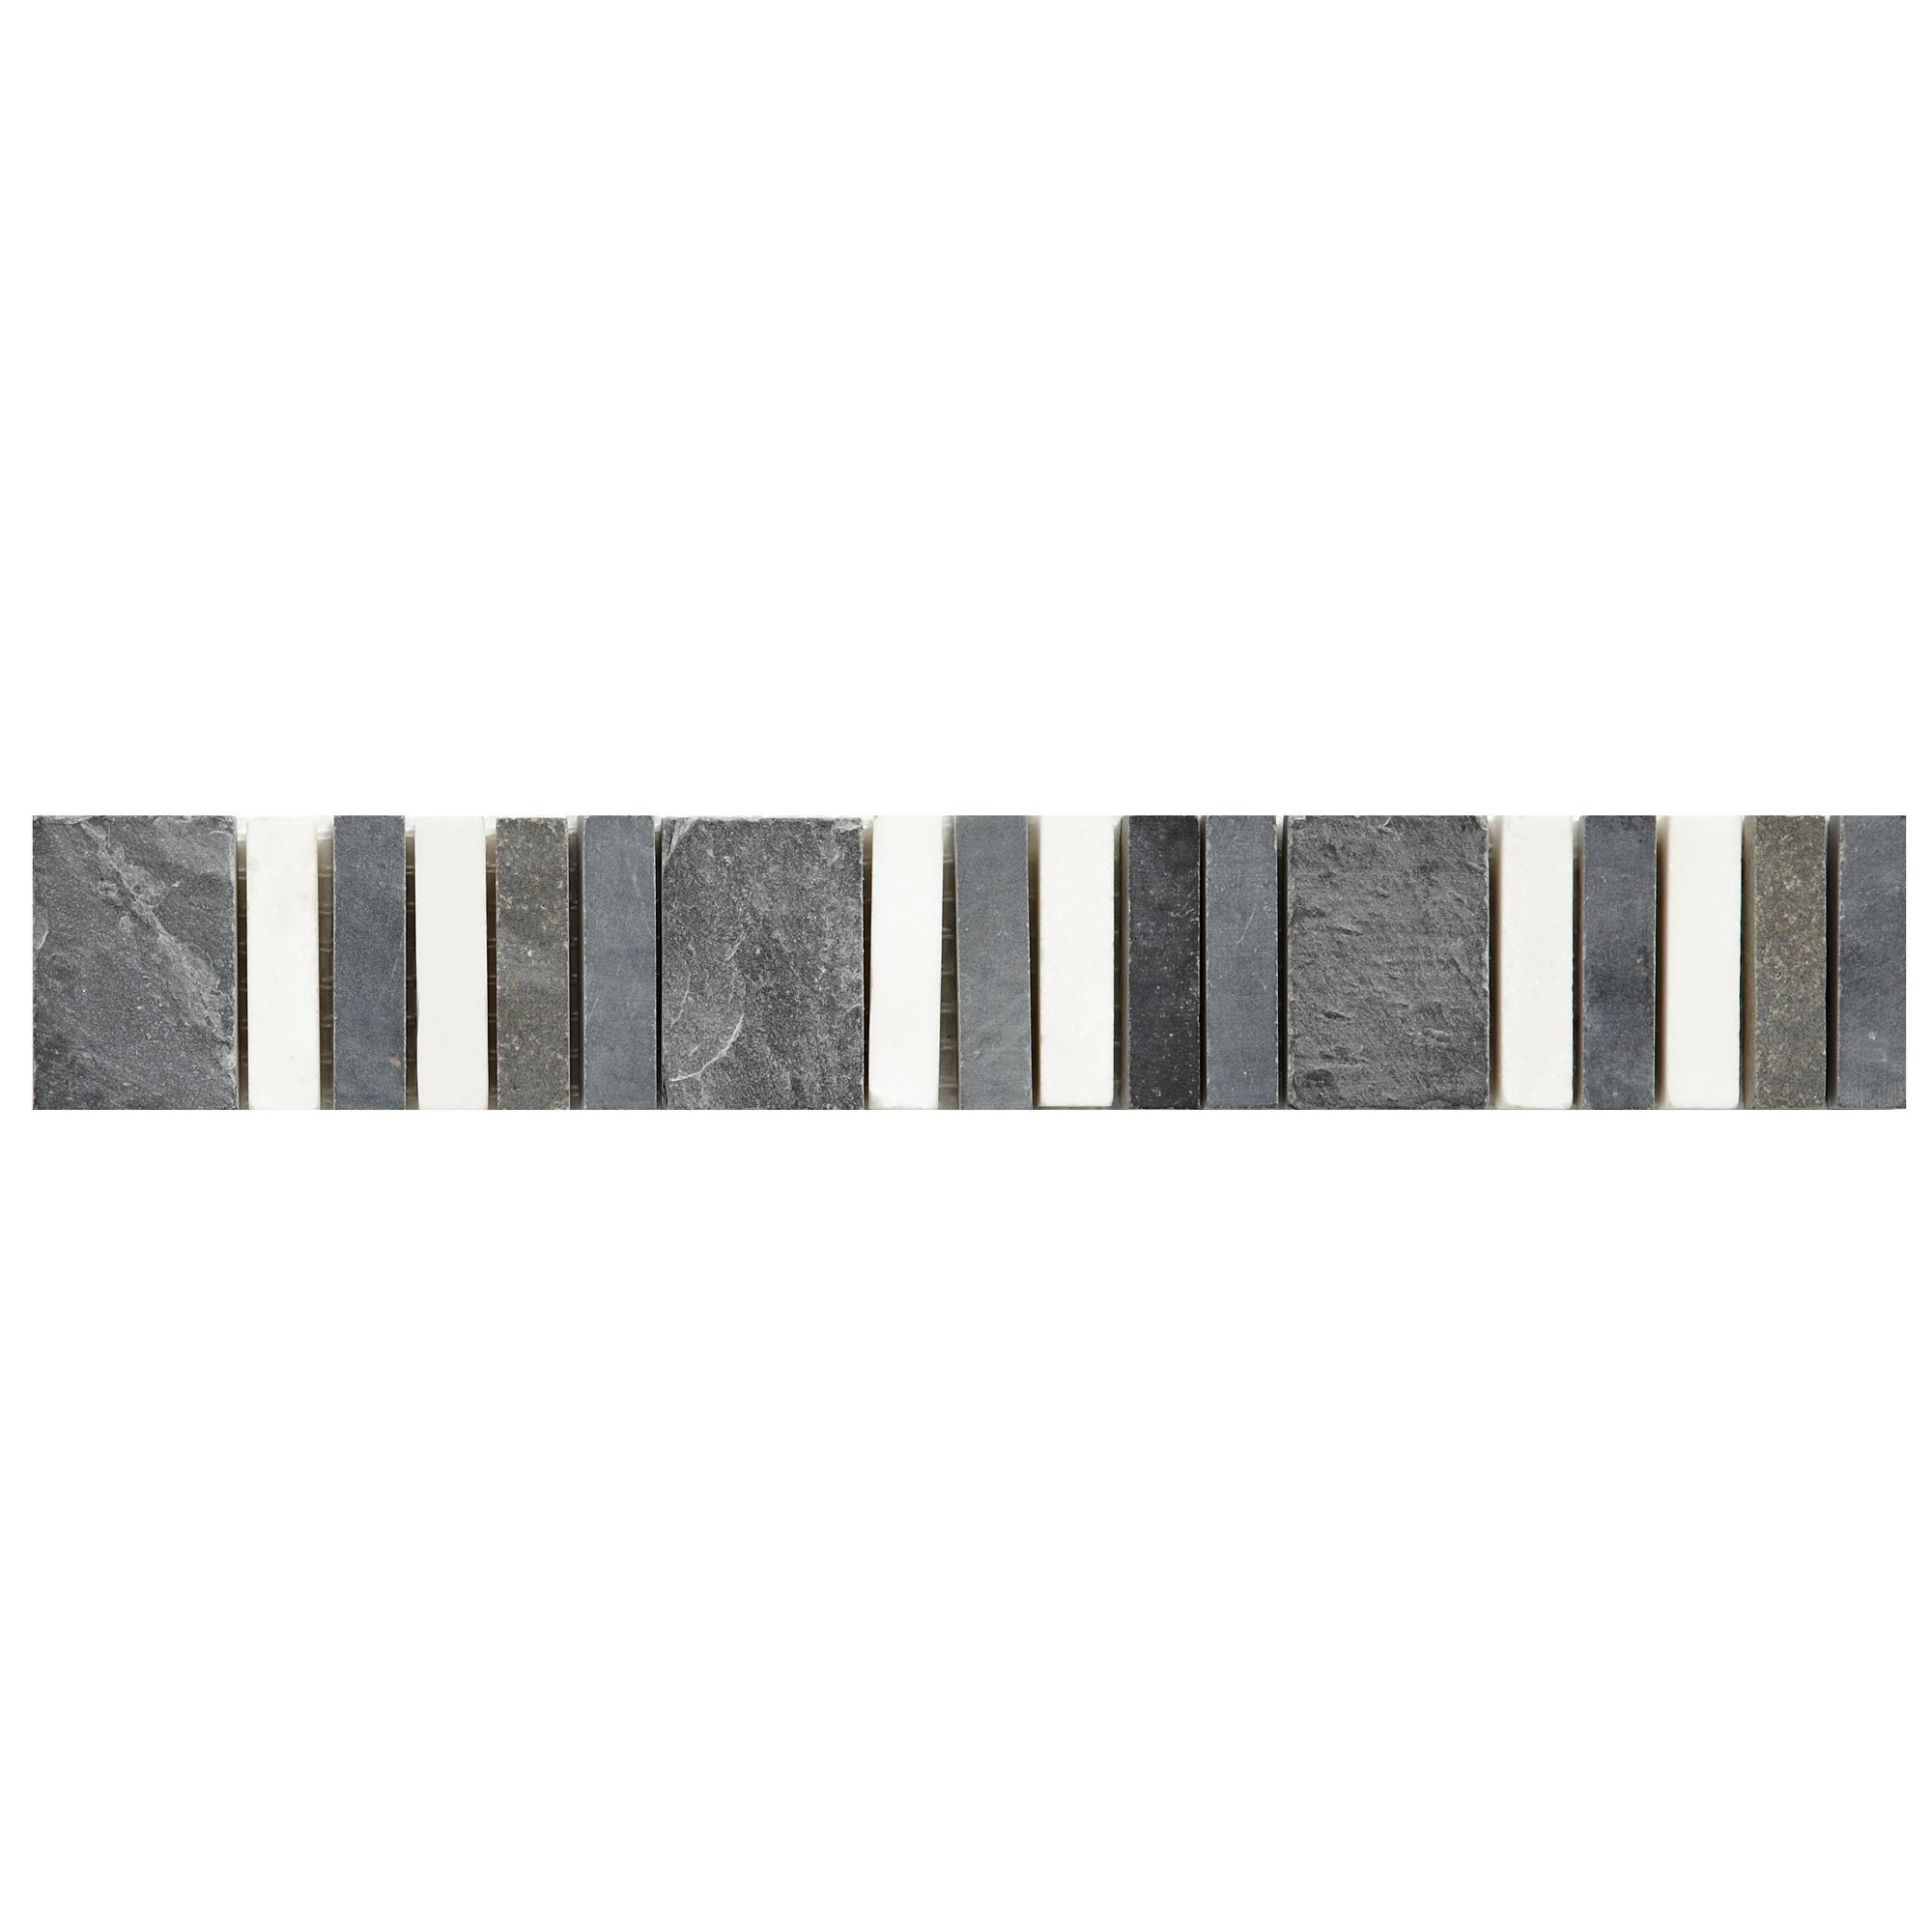 Natural Travertine Mosaic Tile L 300mm W 300mm: Linear Grey Glass & Stone Mosaic Tile, (L)300mm (W)300mm